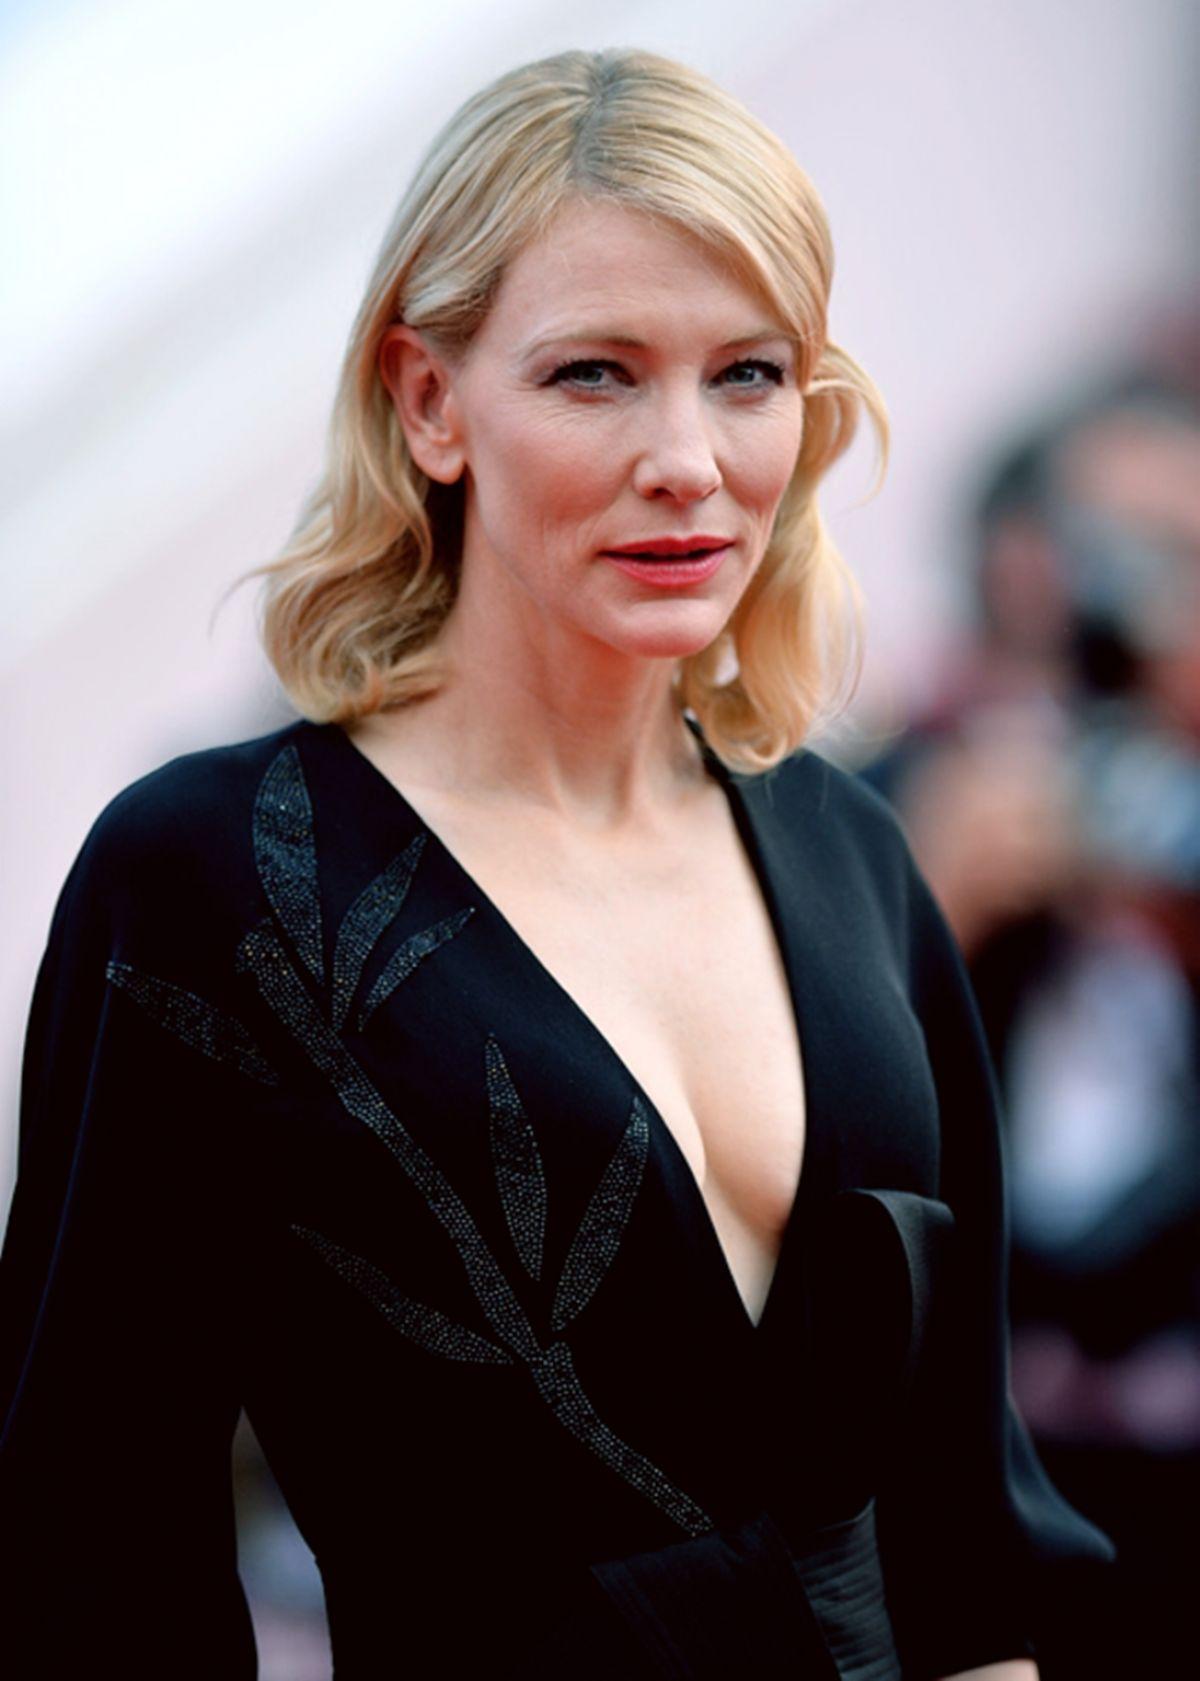 CATE BLANCHETT at Sicario Premiere at Cannes Film Festival